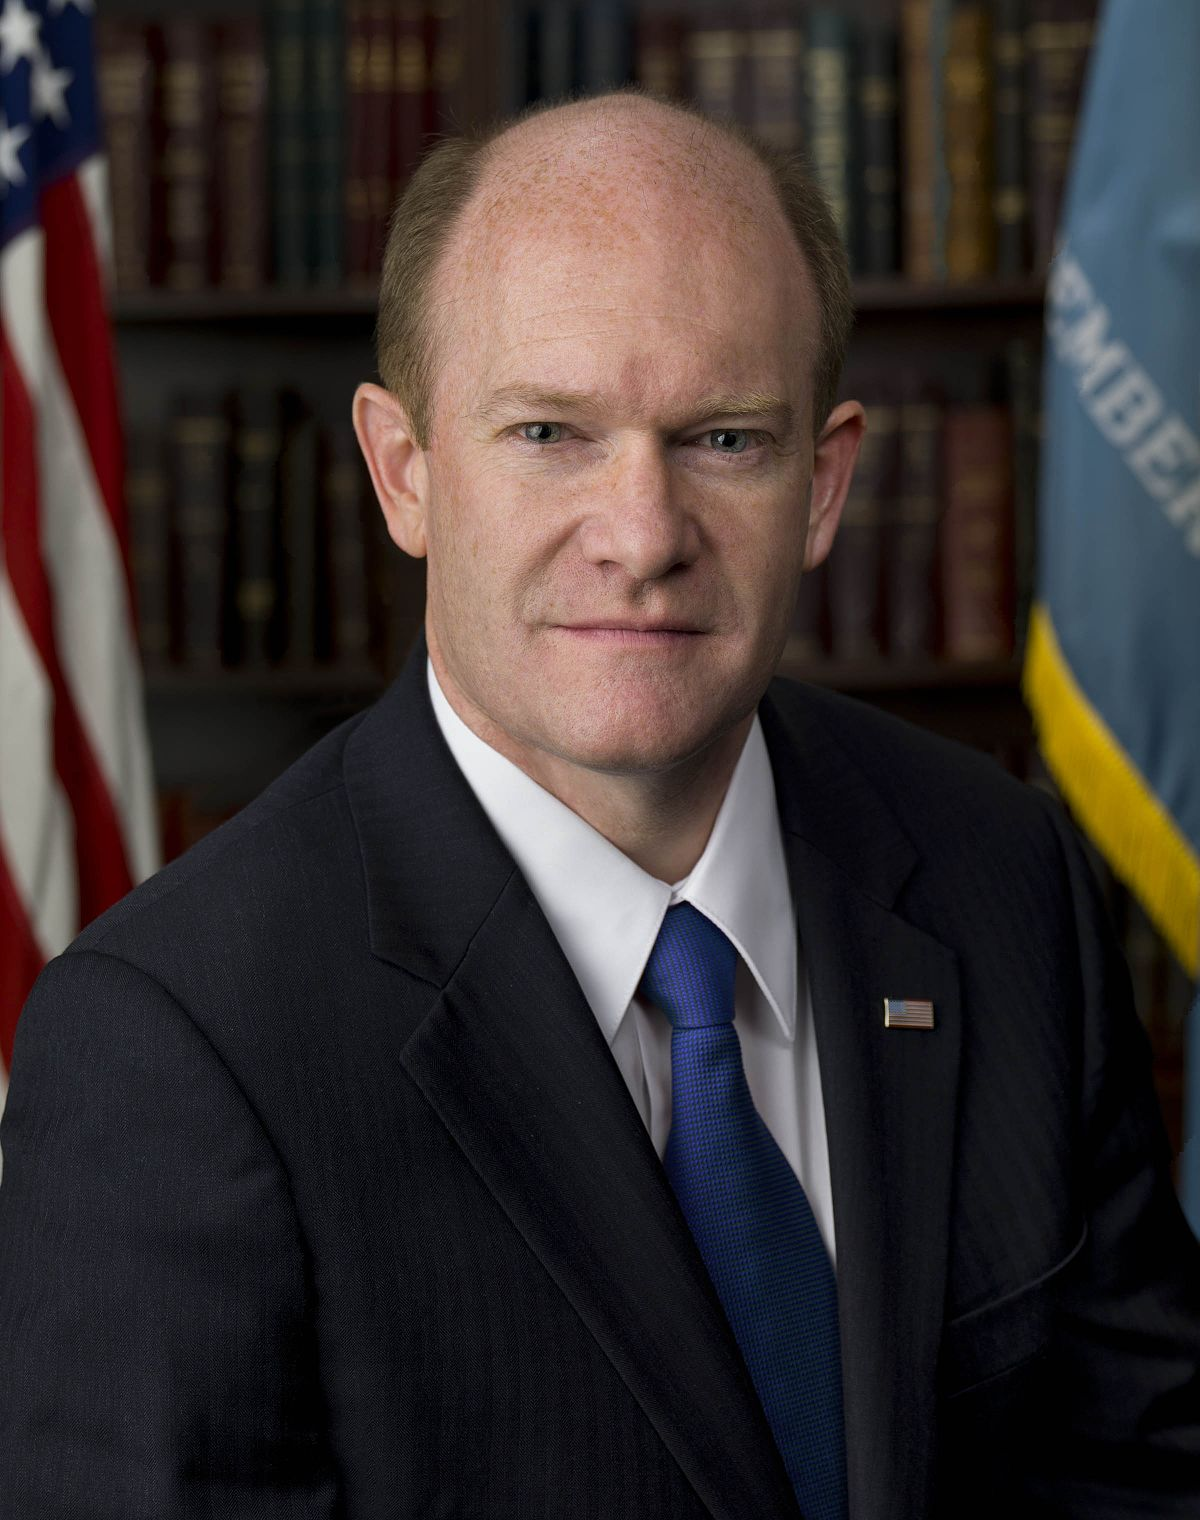 Chris_Coons,_official_portrait,_112th_Congress.jpg